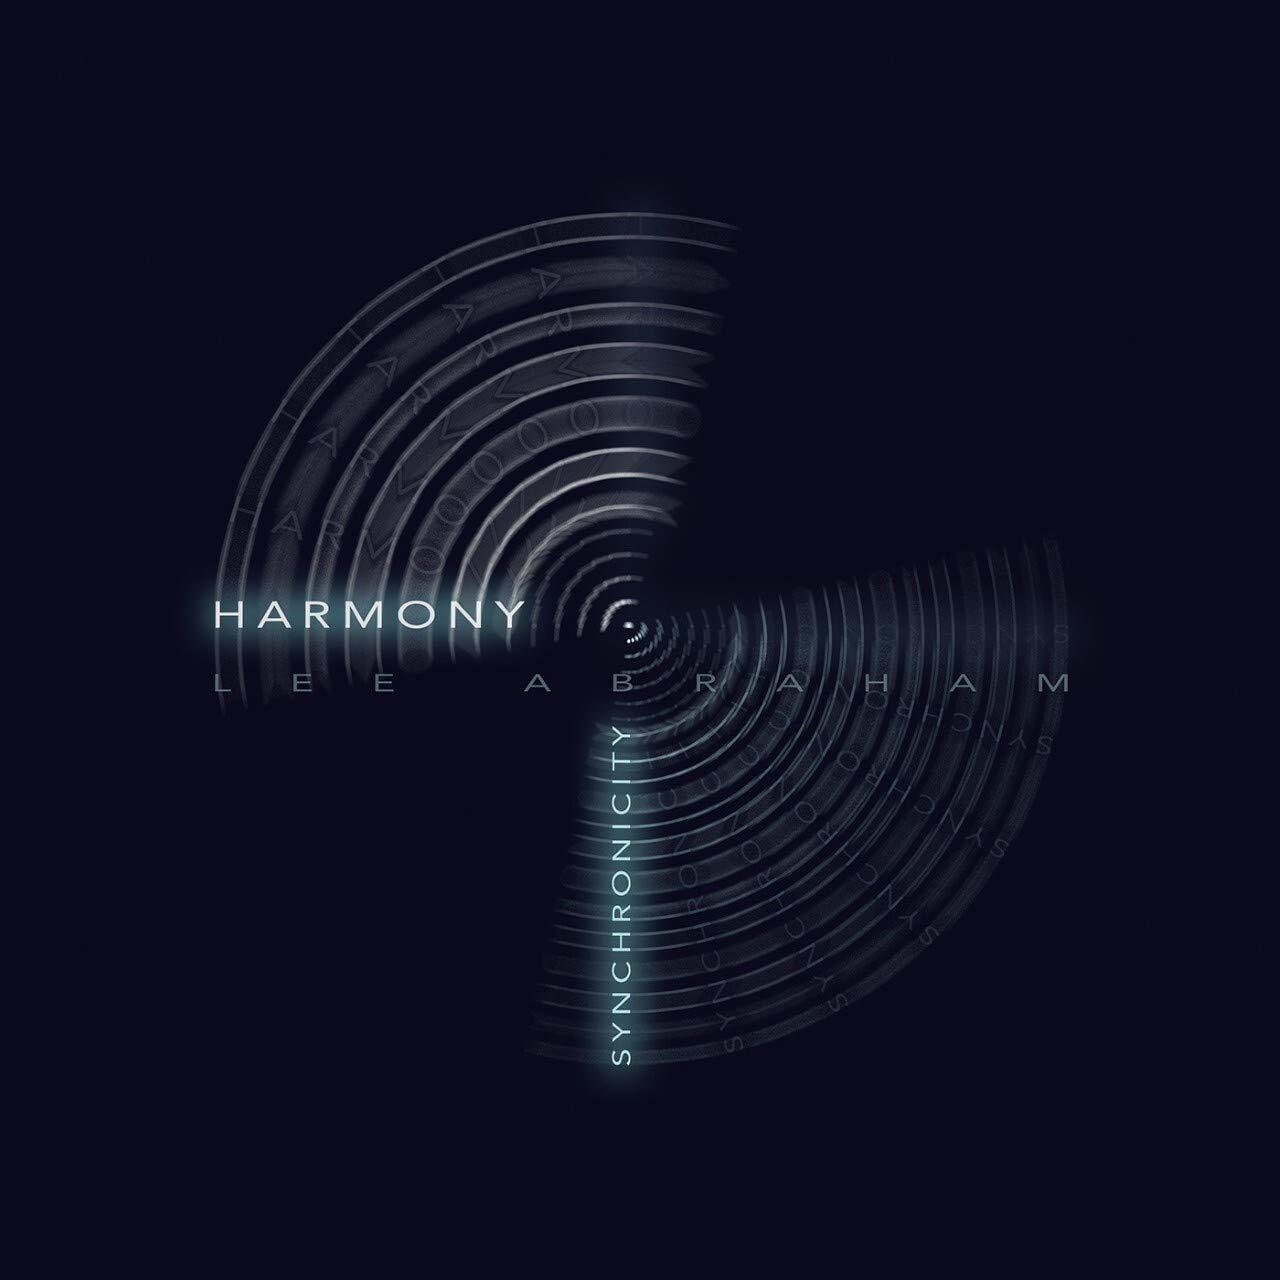 Lee Abraham – Harmony / Synchronicity (2020) [FLAC]